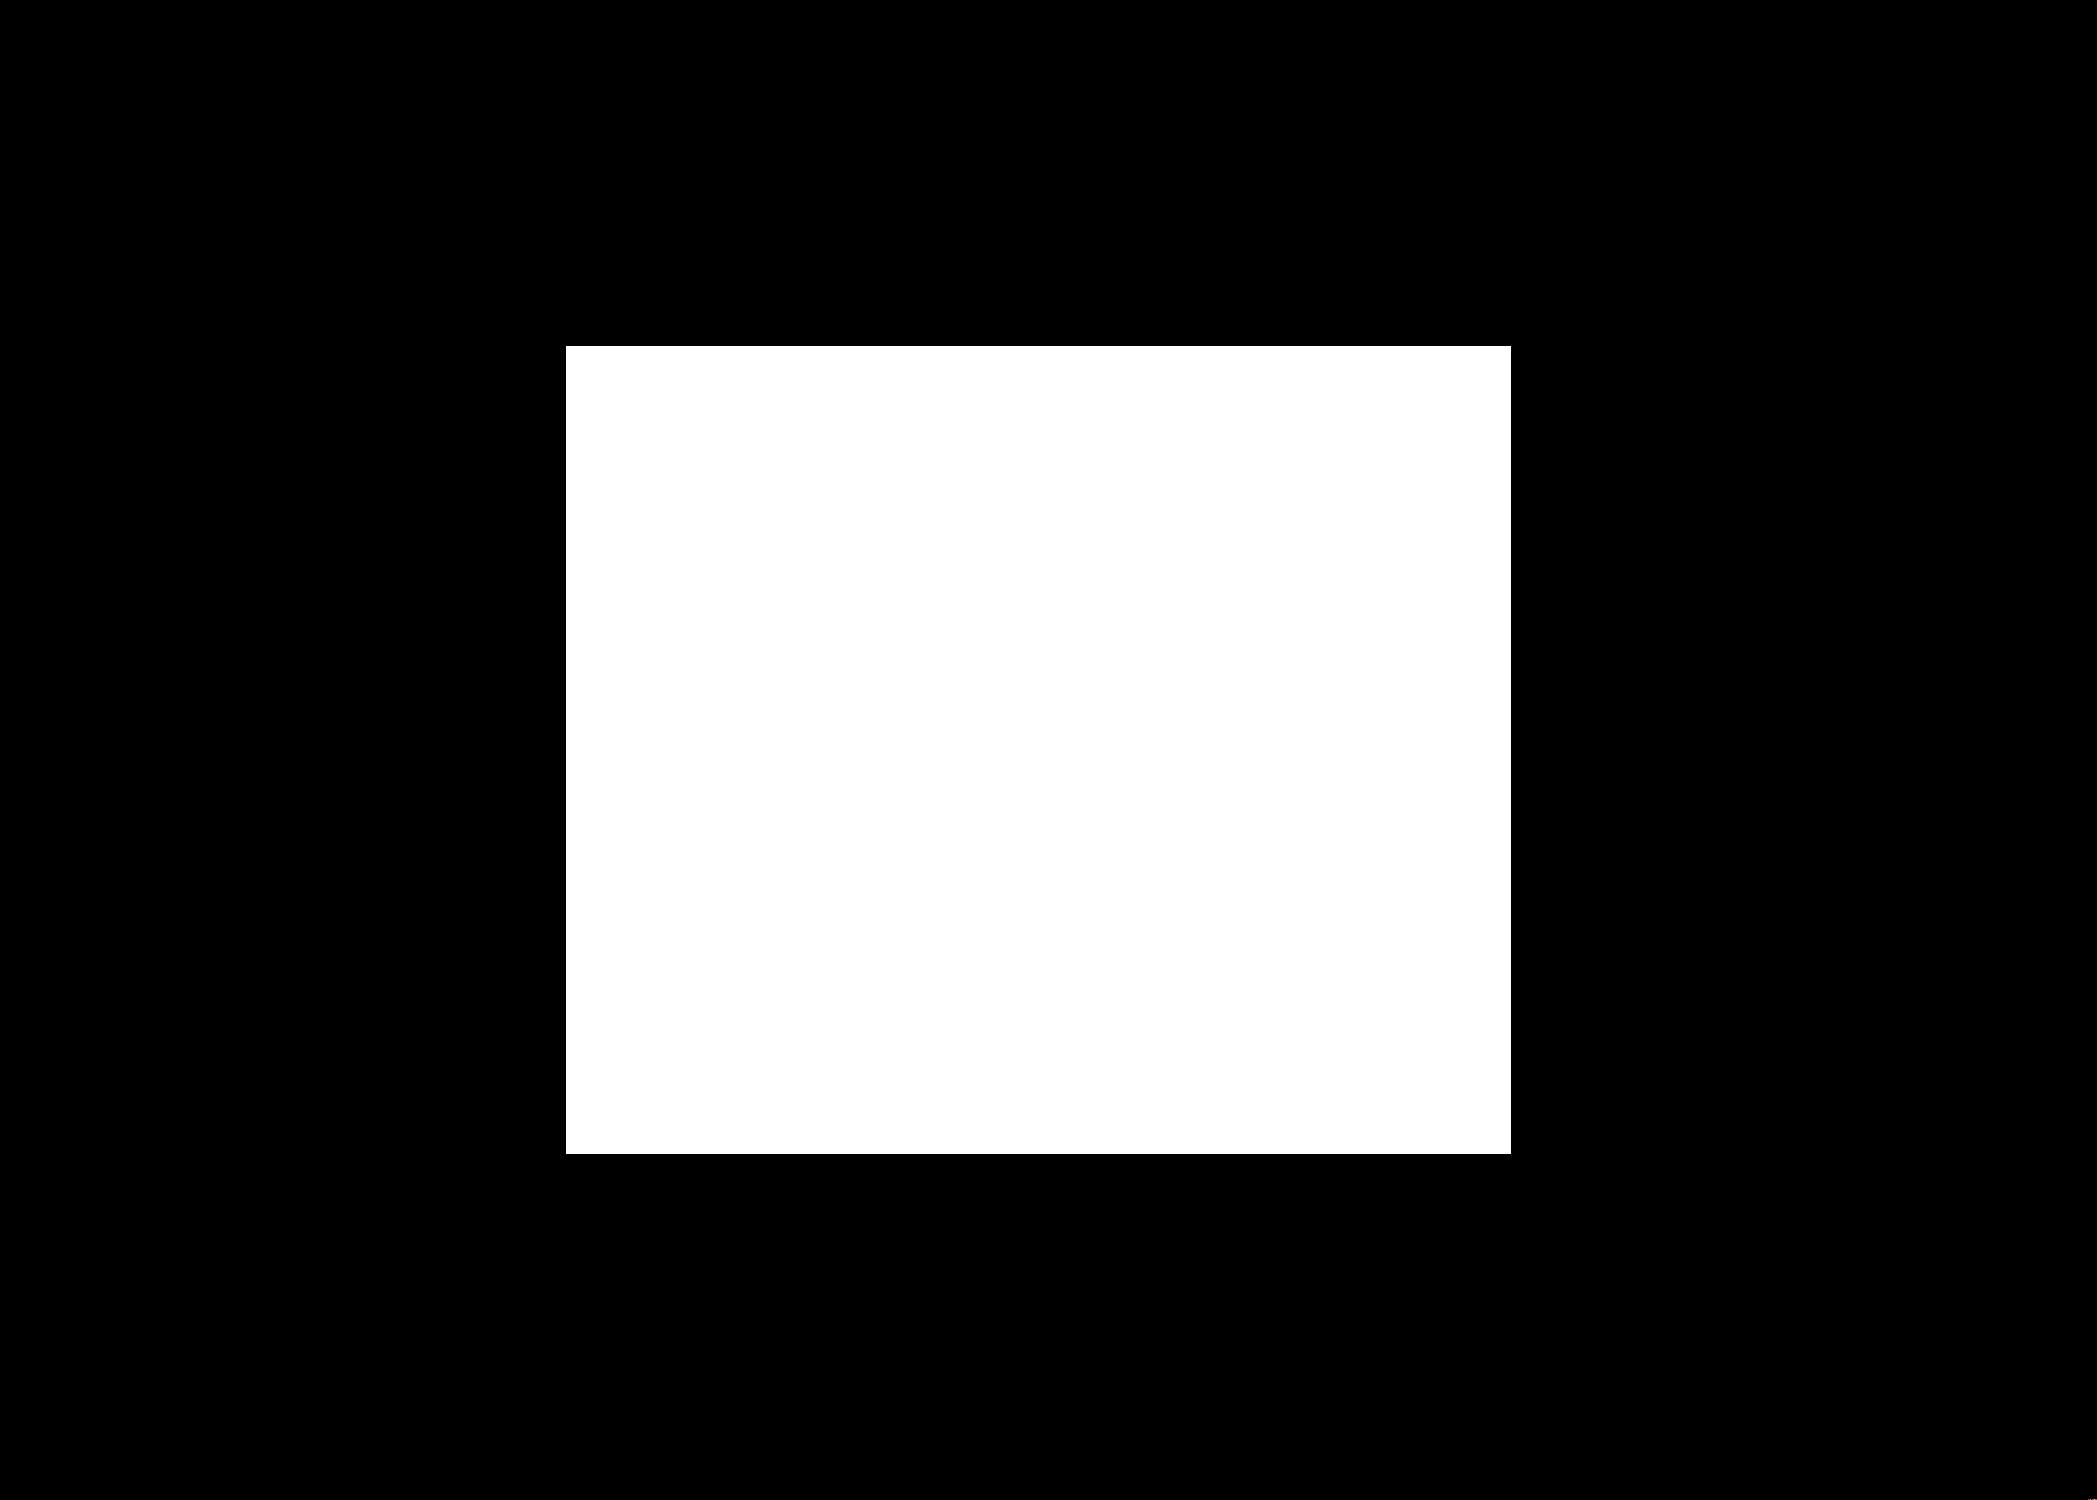 PIXWORTH MEDIA